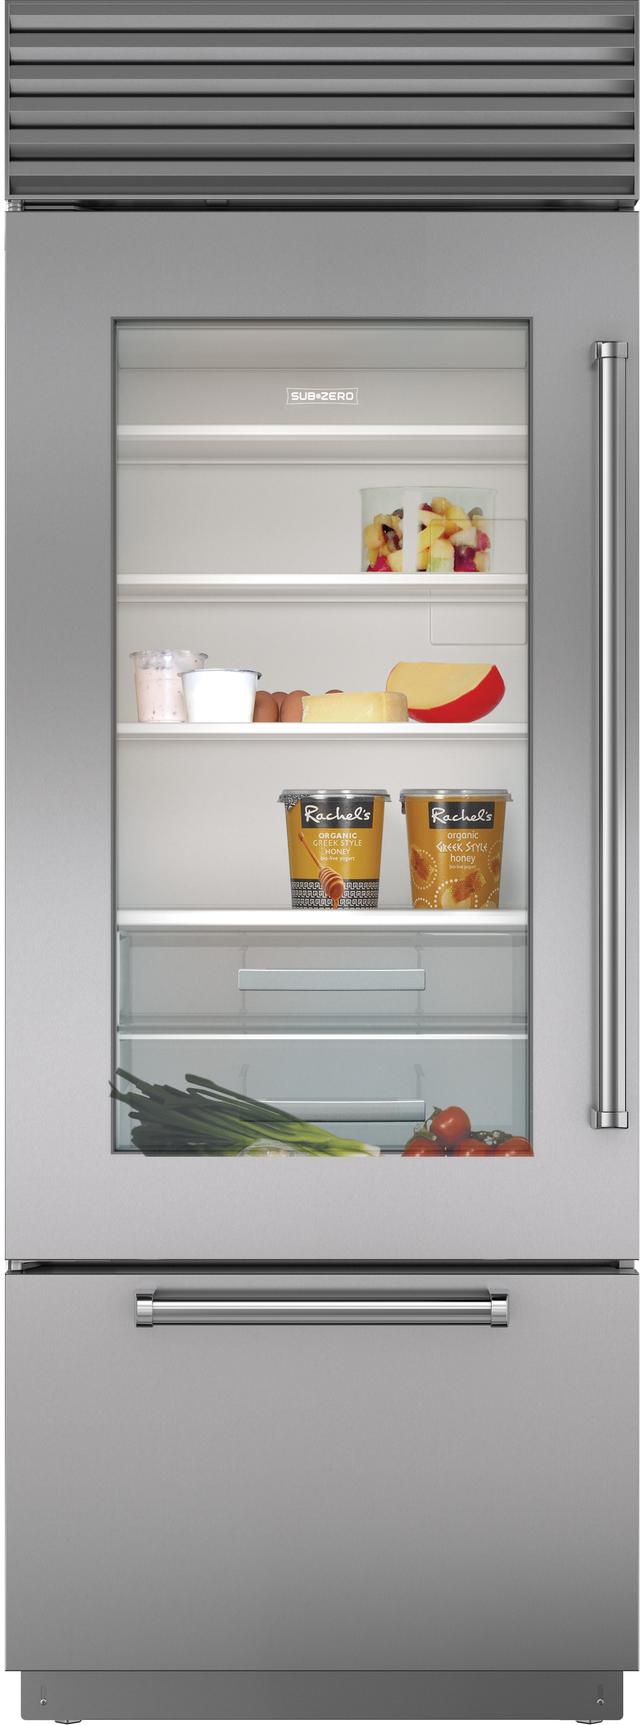 Sub-Zero® 17.3 Cu. Ft. Built In Bottom Freezer Refrigerator-Stainless Steel-BI-30UA/S/PH-LH